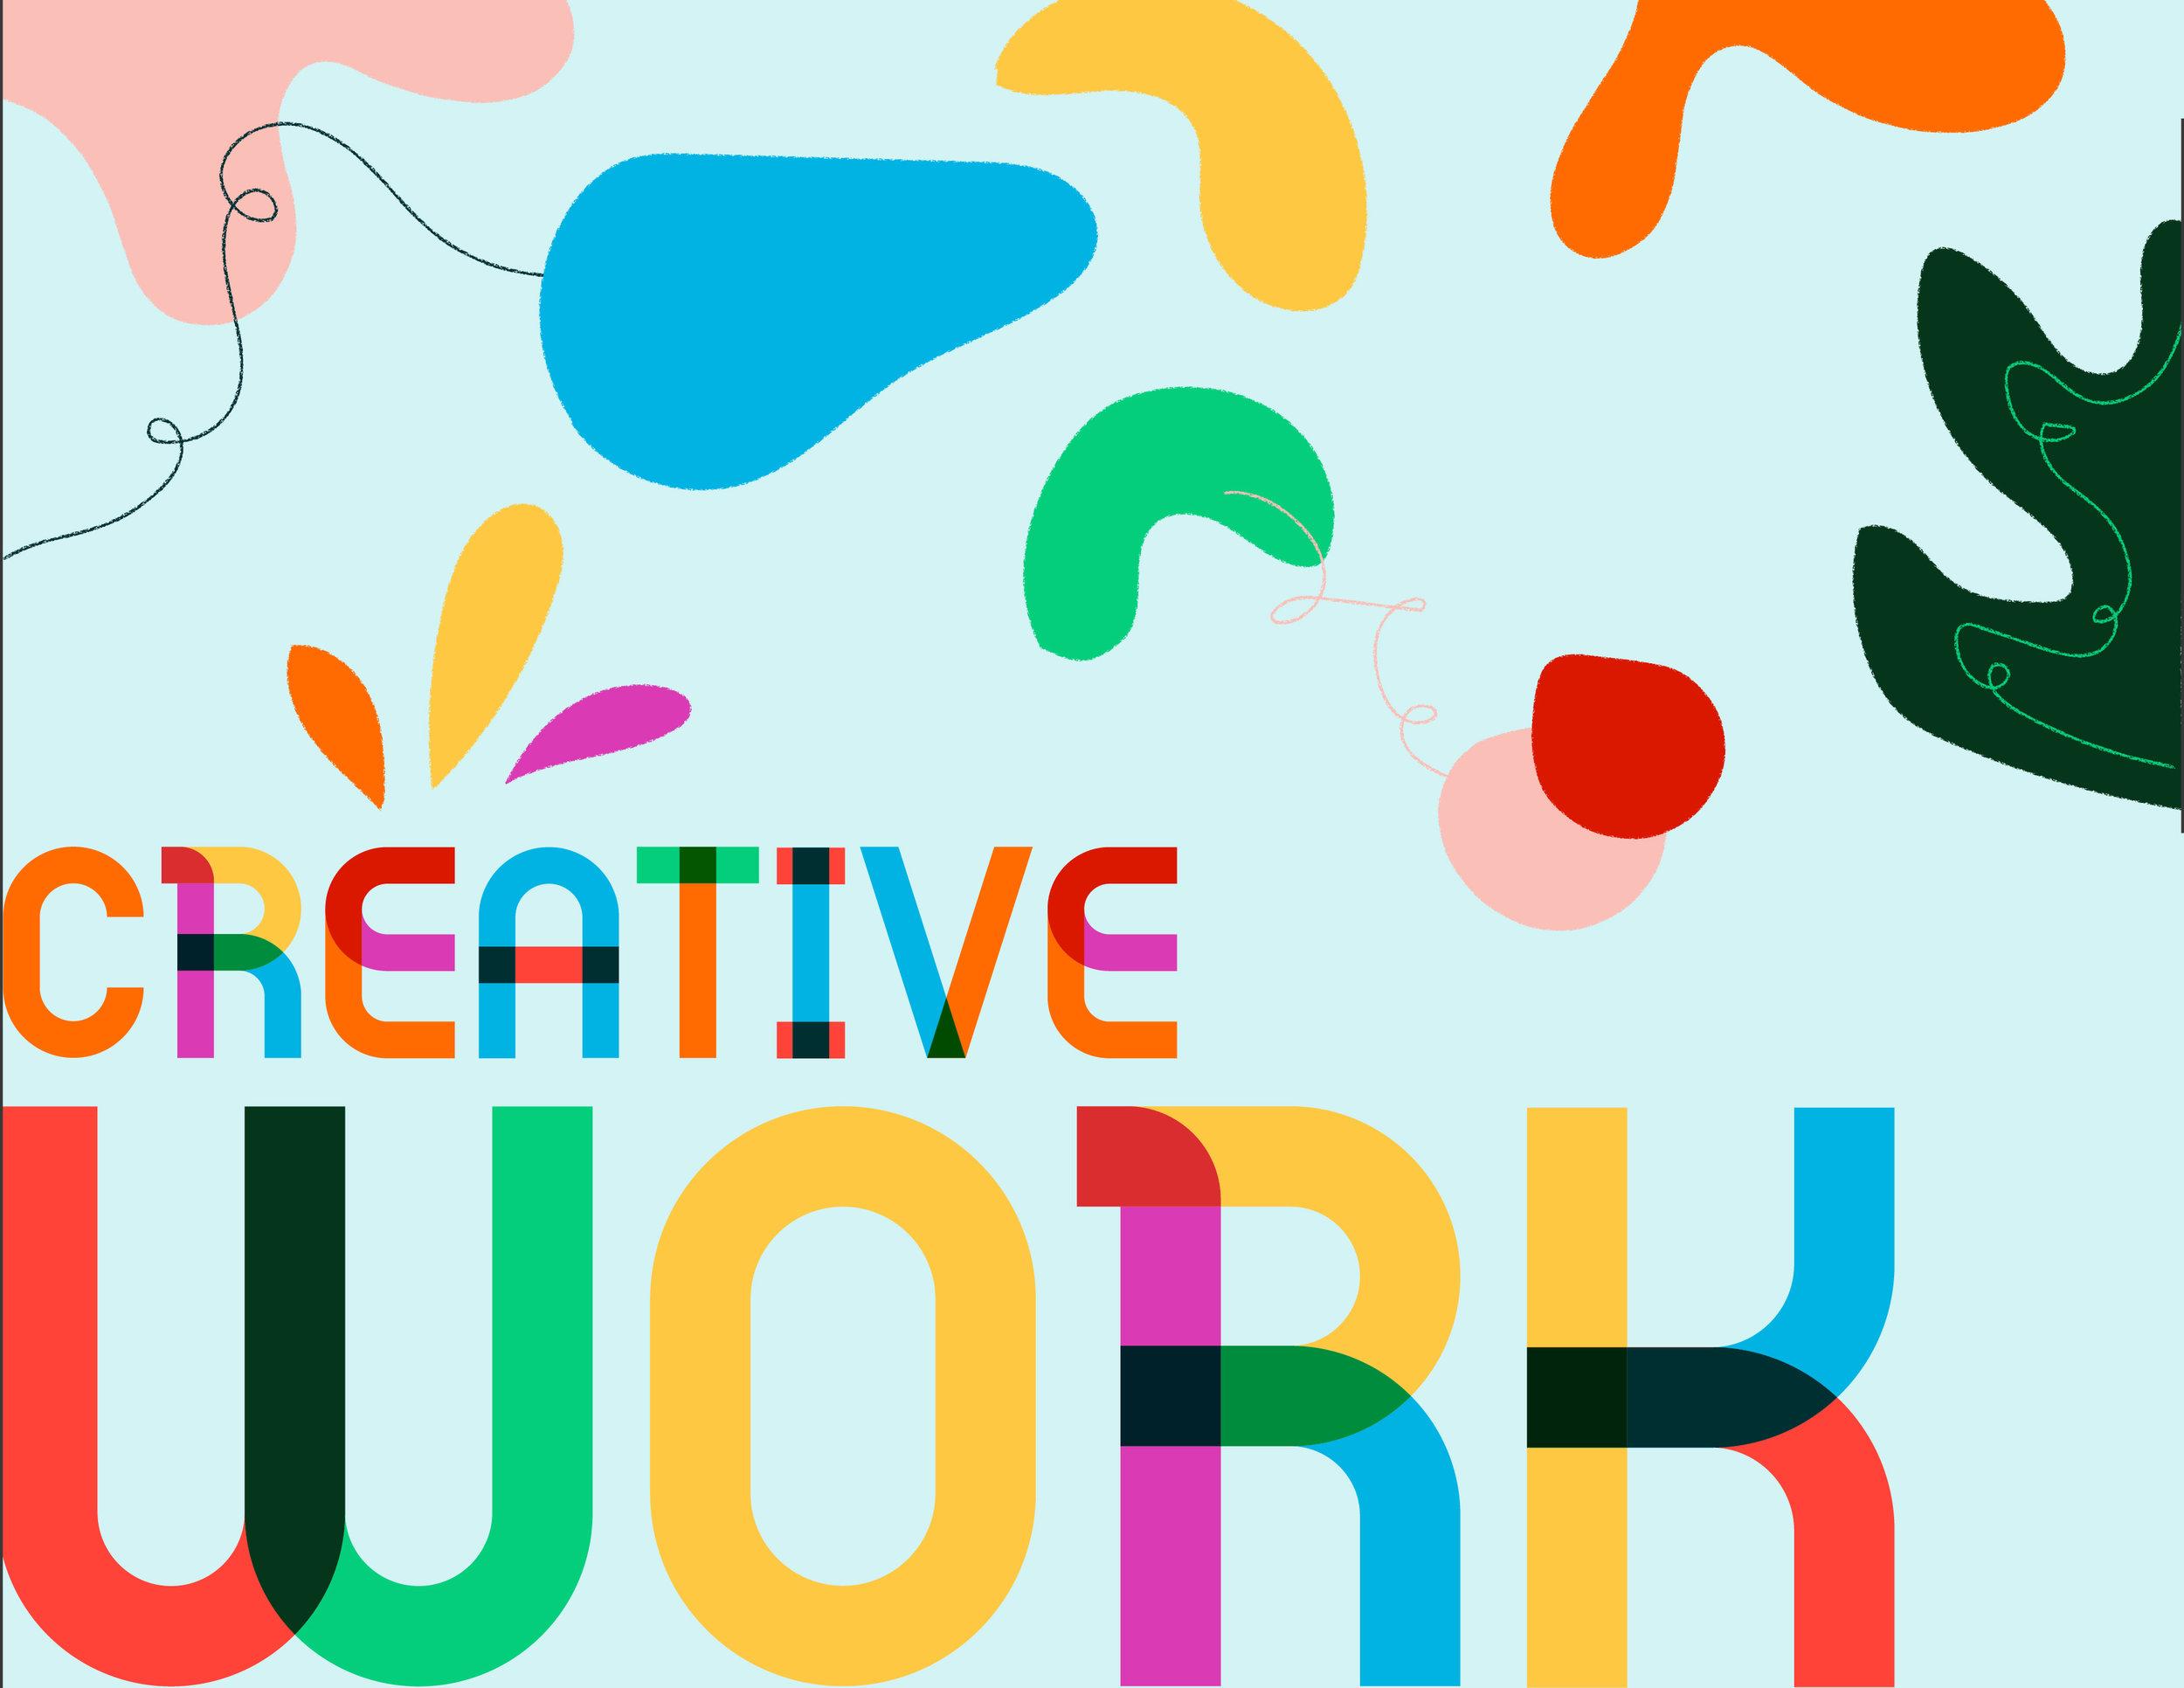 Creative_work_v1.1-01.jpg